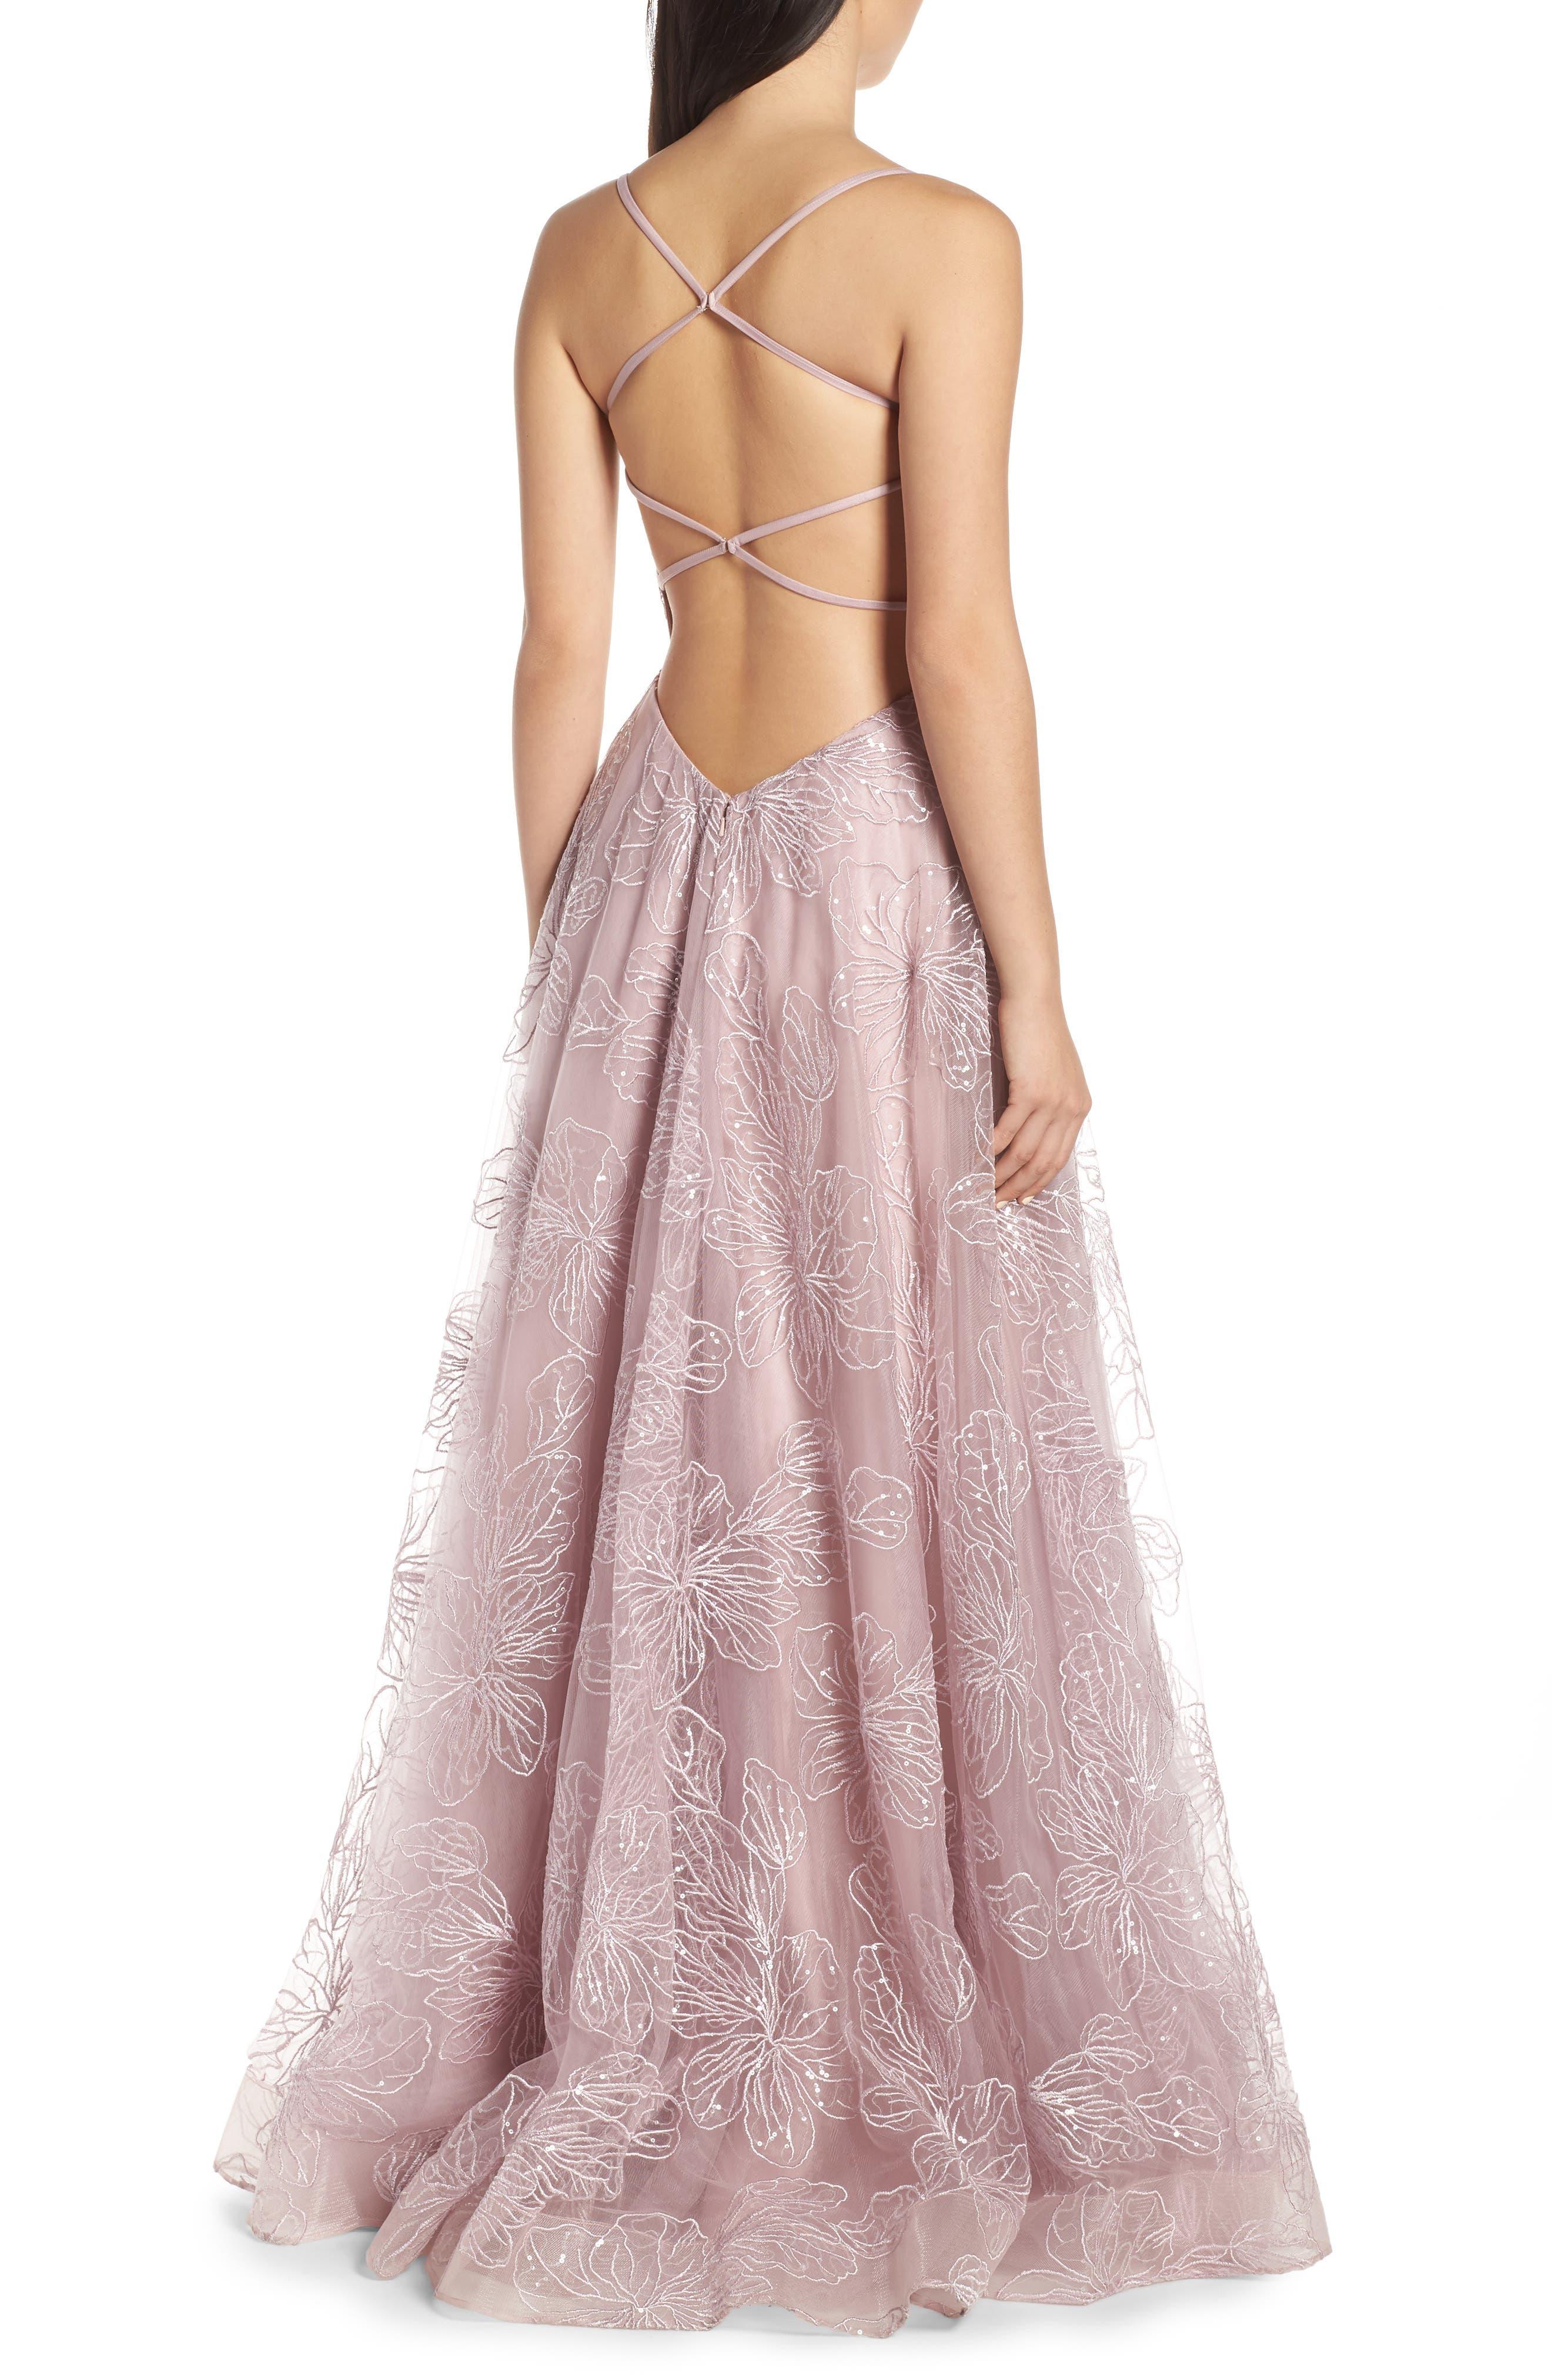 LA FEMME, Metallic Floral Embellished Evening Dress, Alternate thumbnail 2, color, MAUVE